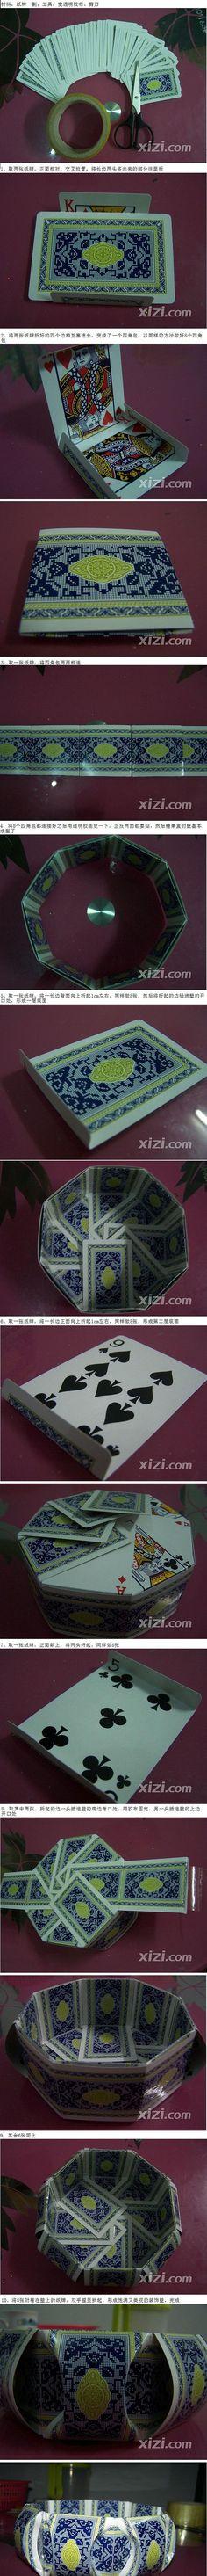 DIY Playing Cards Bowl DIY Projects | UsefulDIY.com